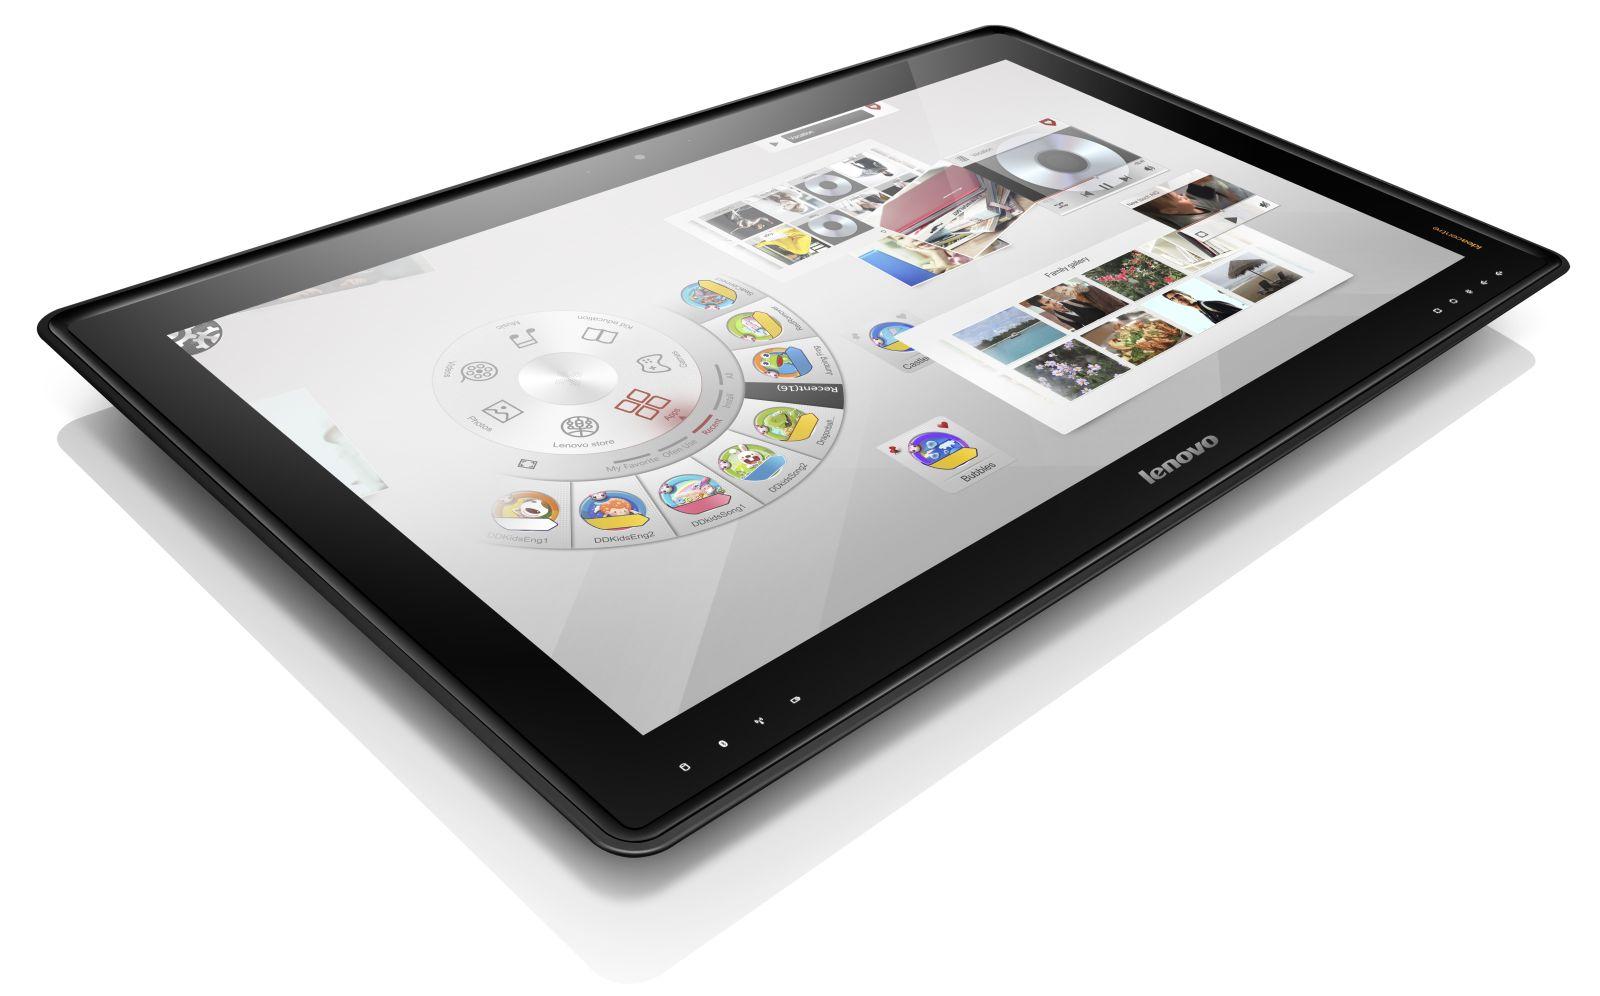 Lenovos Horizon PC Turns Your Coffee Table Into a